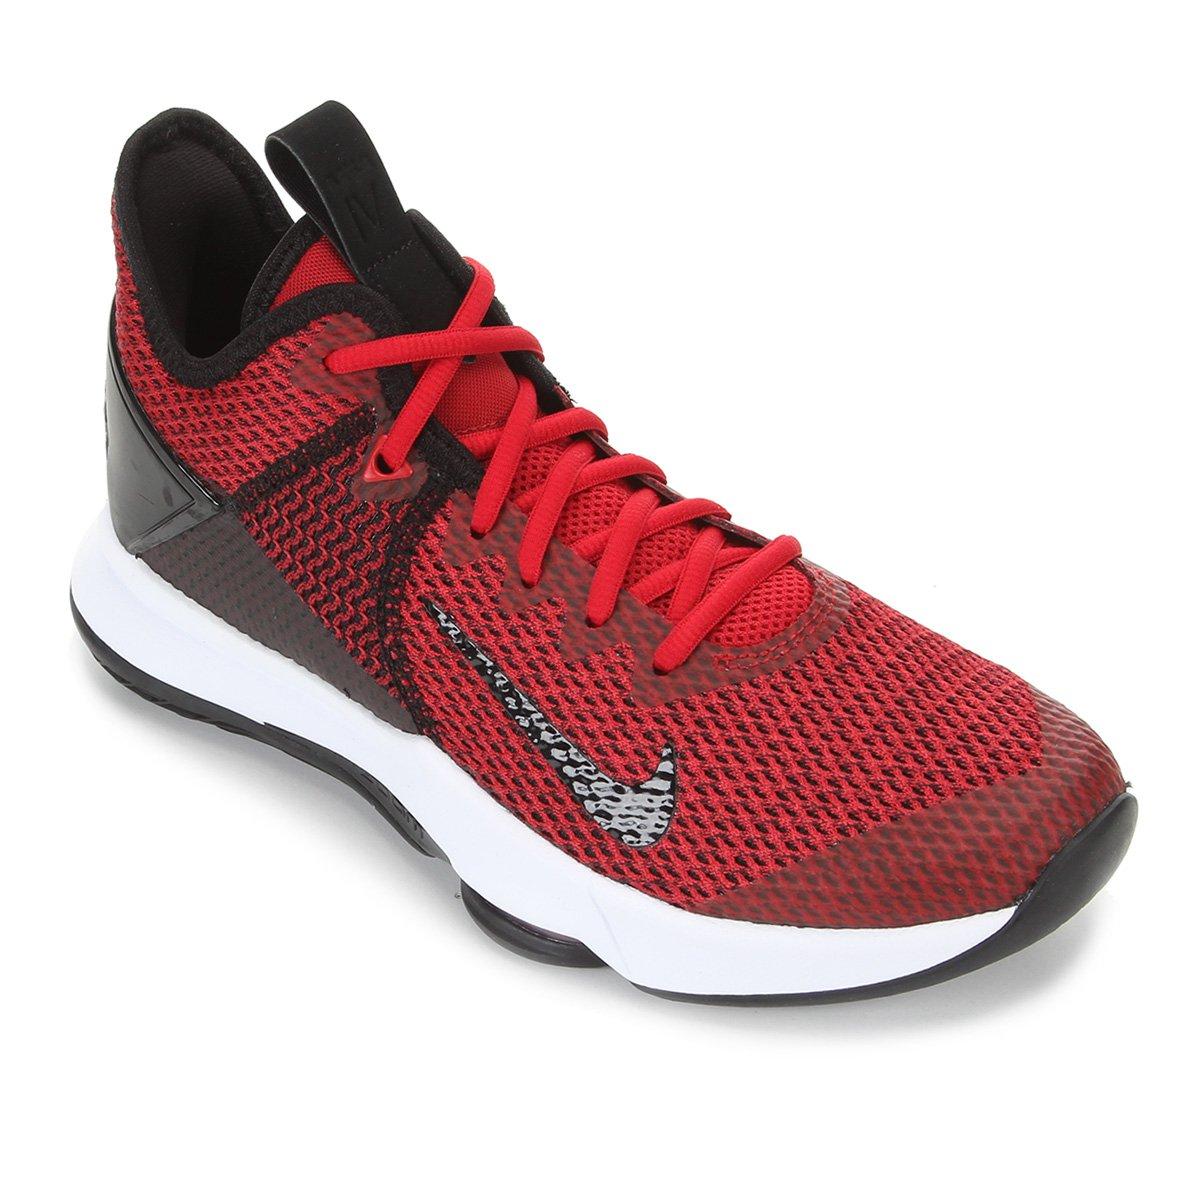 Tênis Nike Lebron Witness IV Masculino - Preto e Vermelho